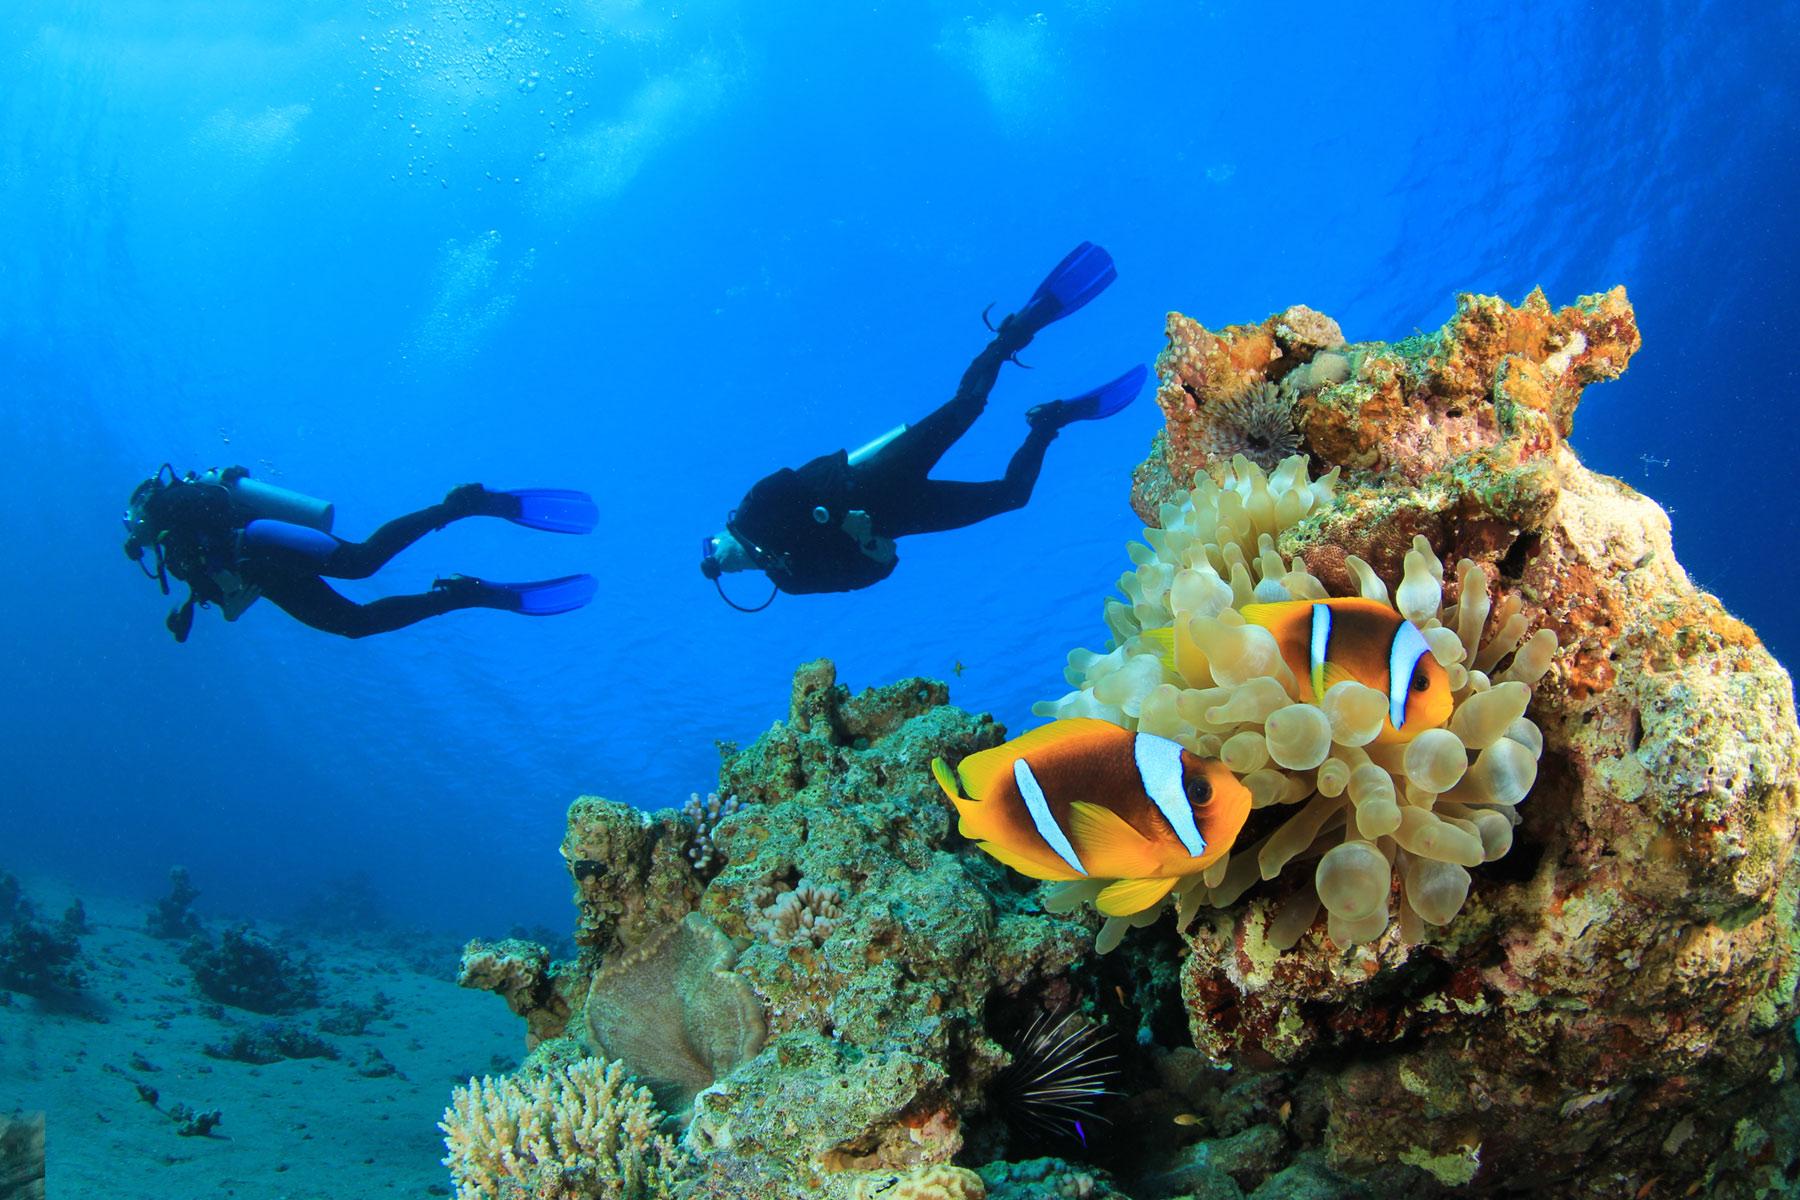 Recreational scuba diving in Dahab